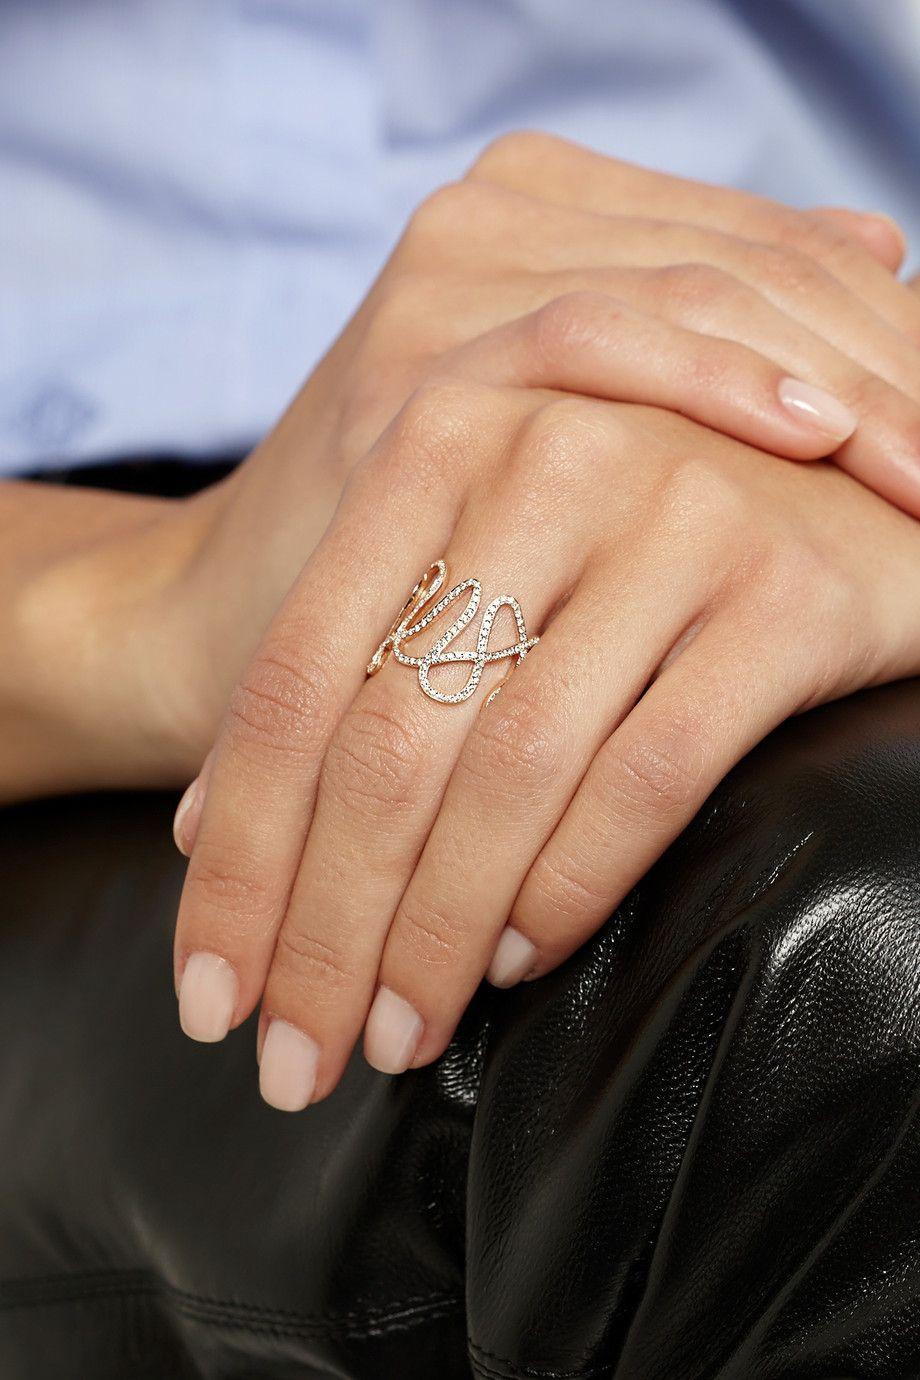 White noise karat rose gold diamond ring repossi on neta